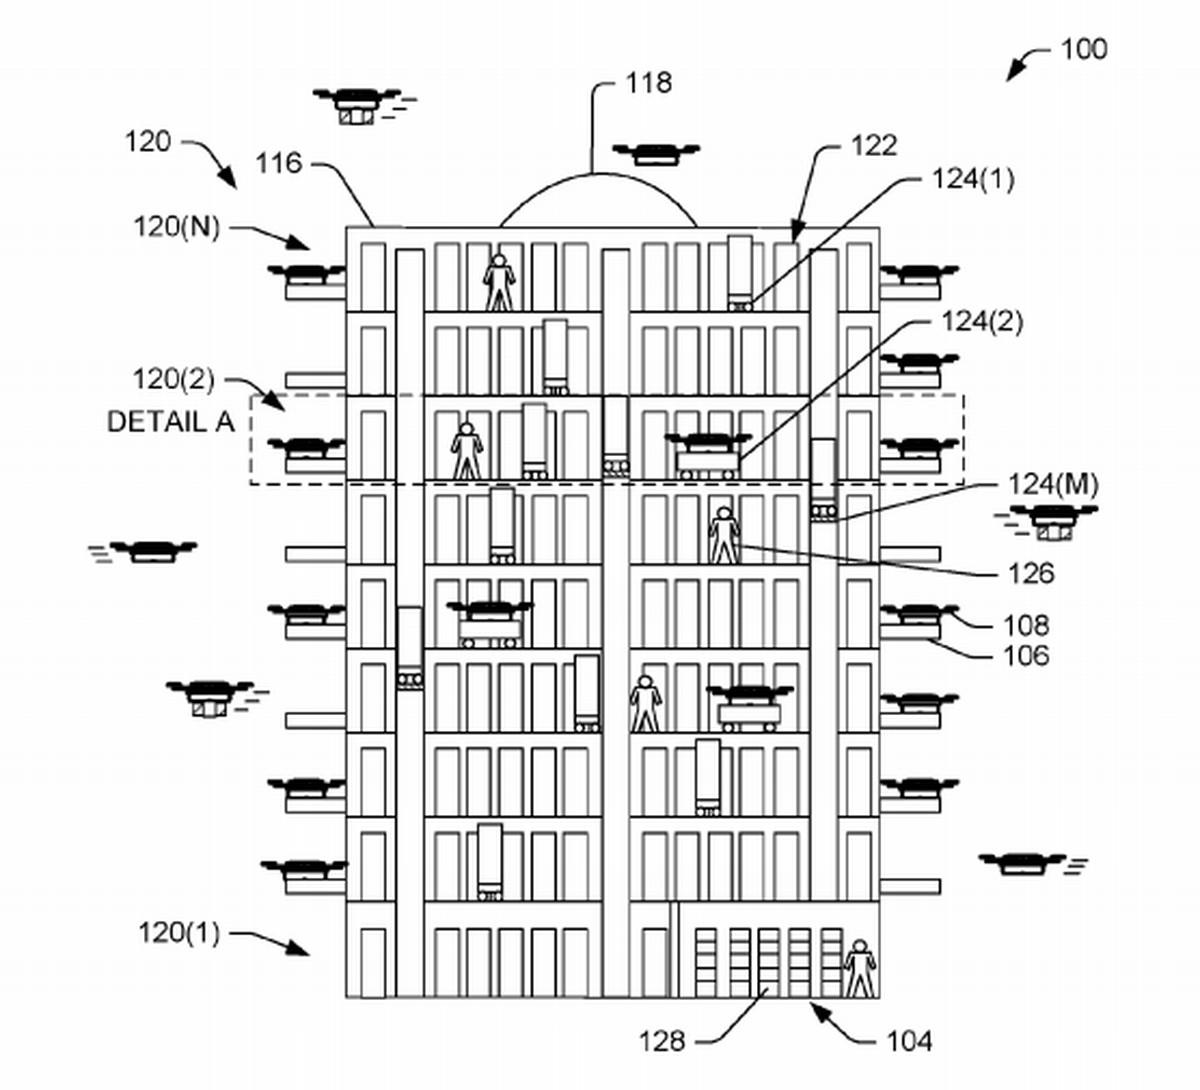 Amazon S Idea For A Massive Drone Dock Looks Like A Cross